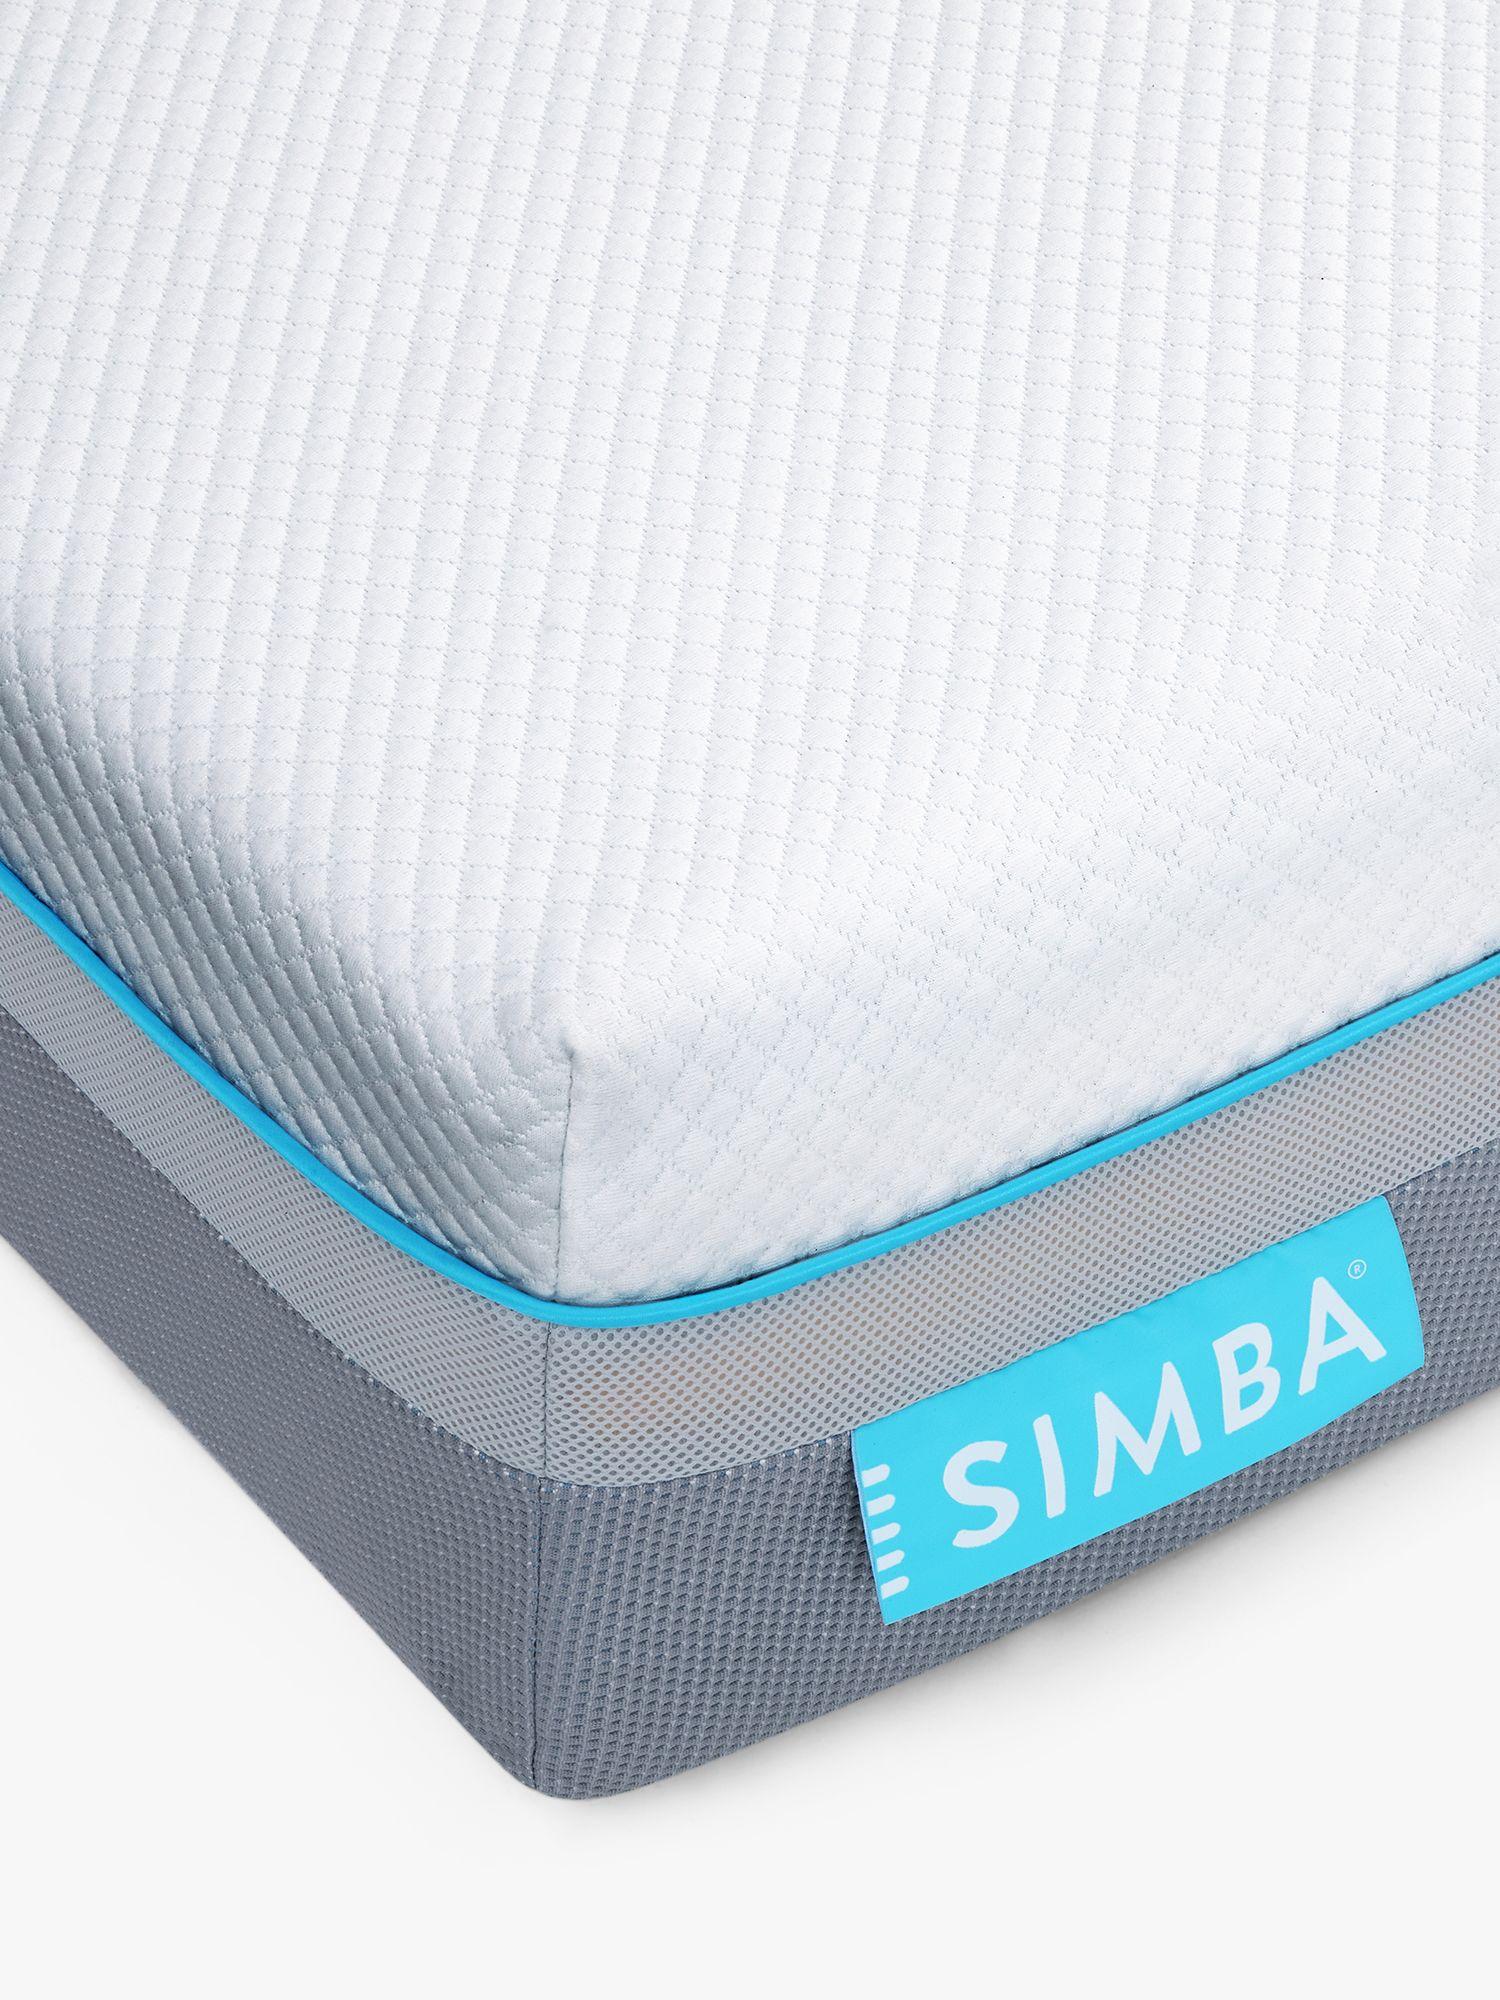 Simba Simba Hybrid® Air Cool Pocket Spring Memory Foam Mattress, Medium Tension, Super King Size